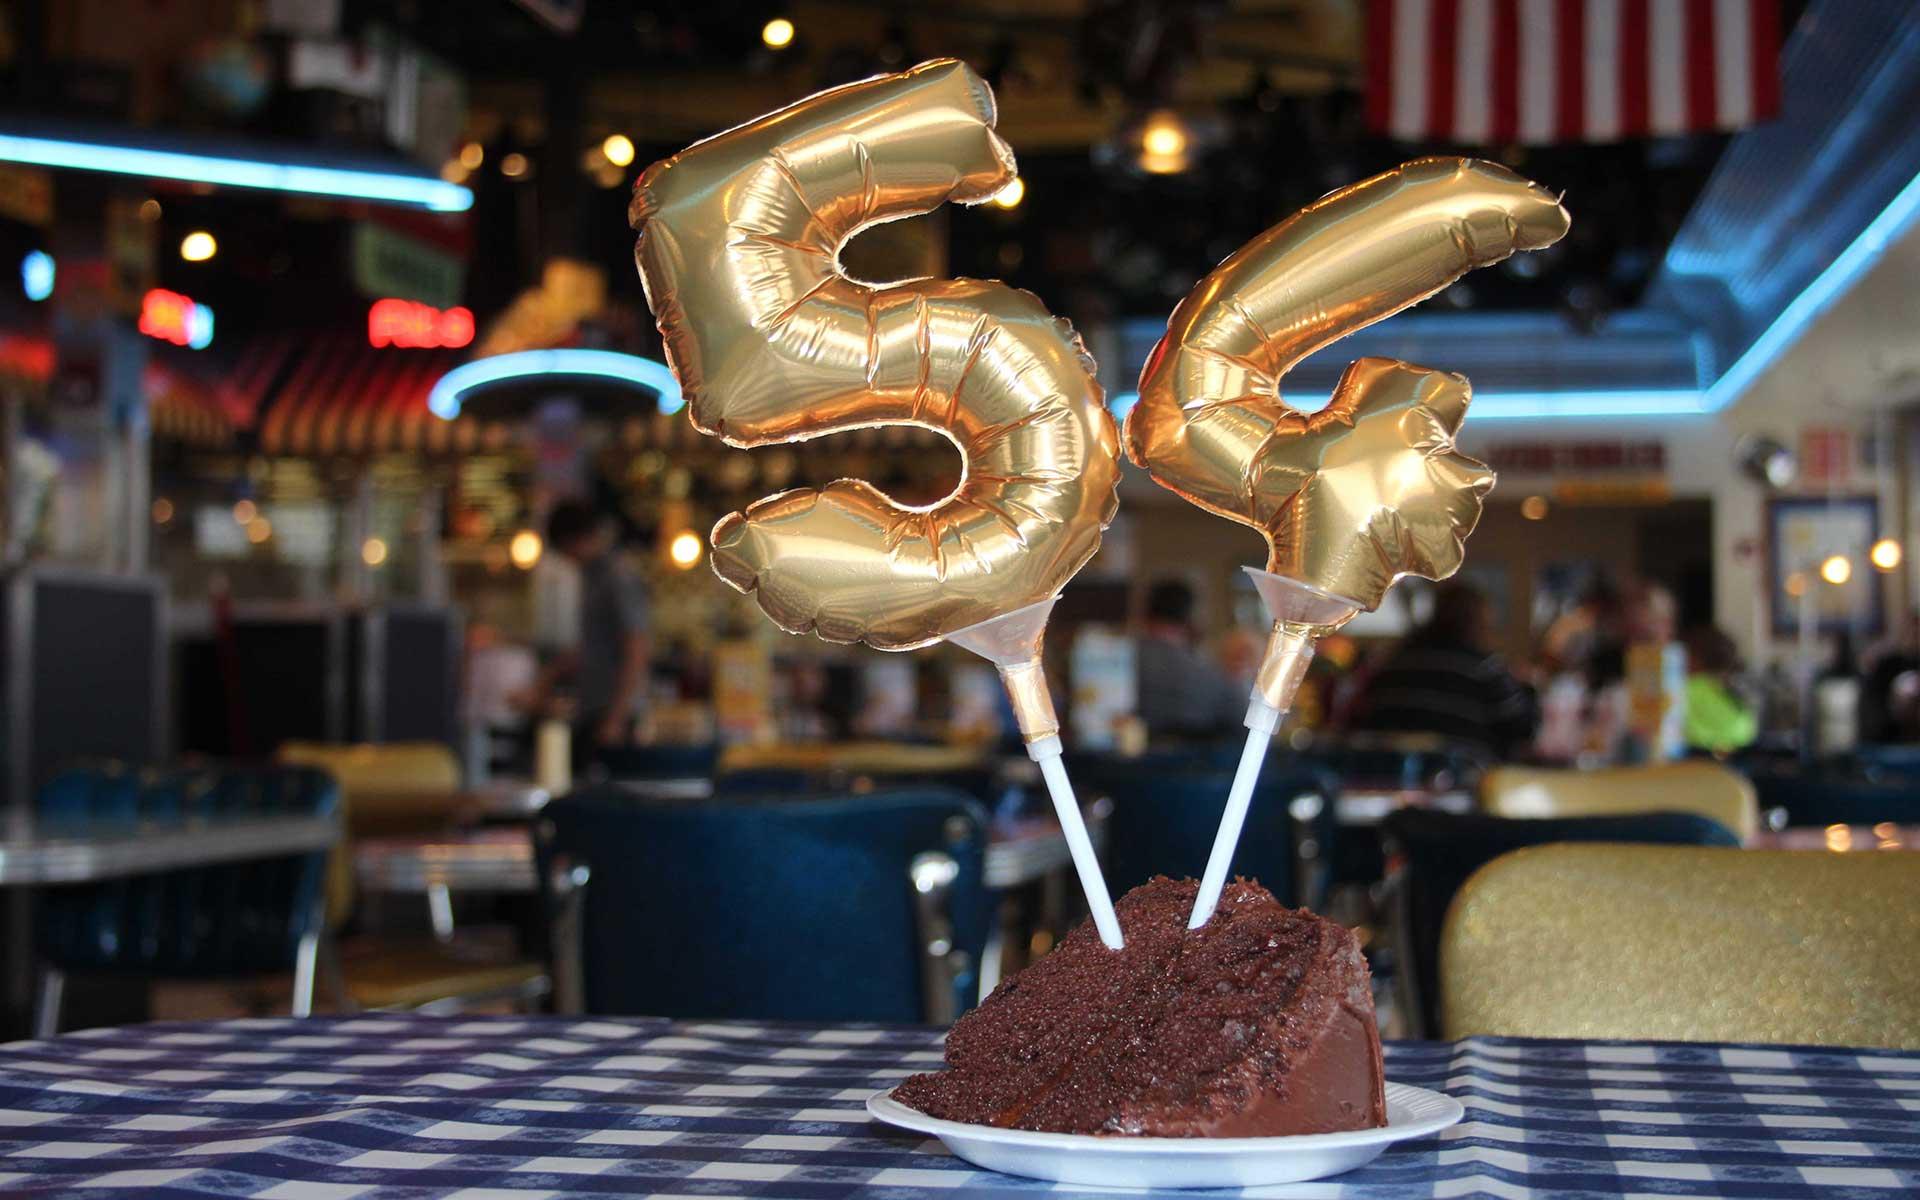 Portillo's 54th Birthday - General News - News | Portillo's